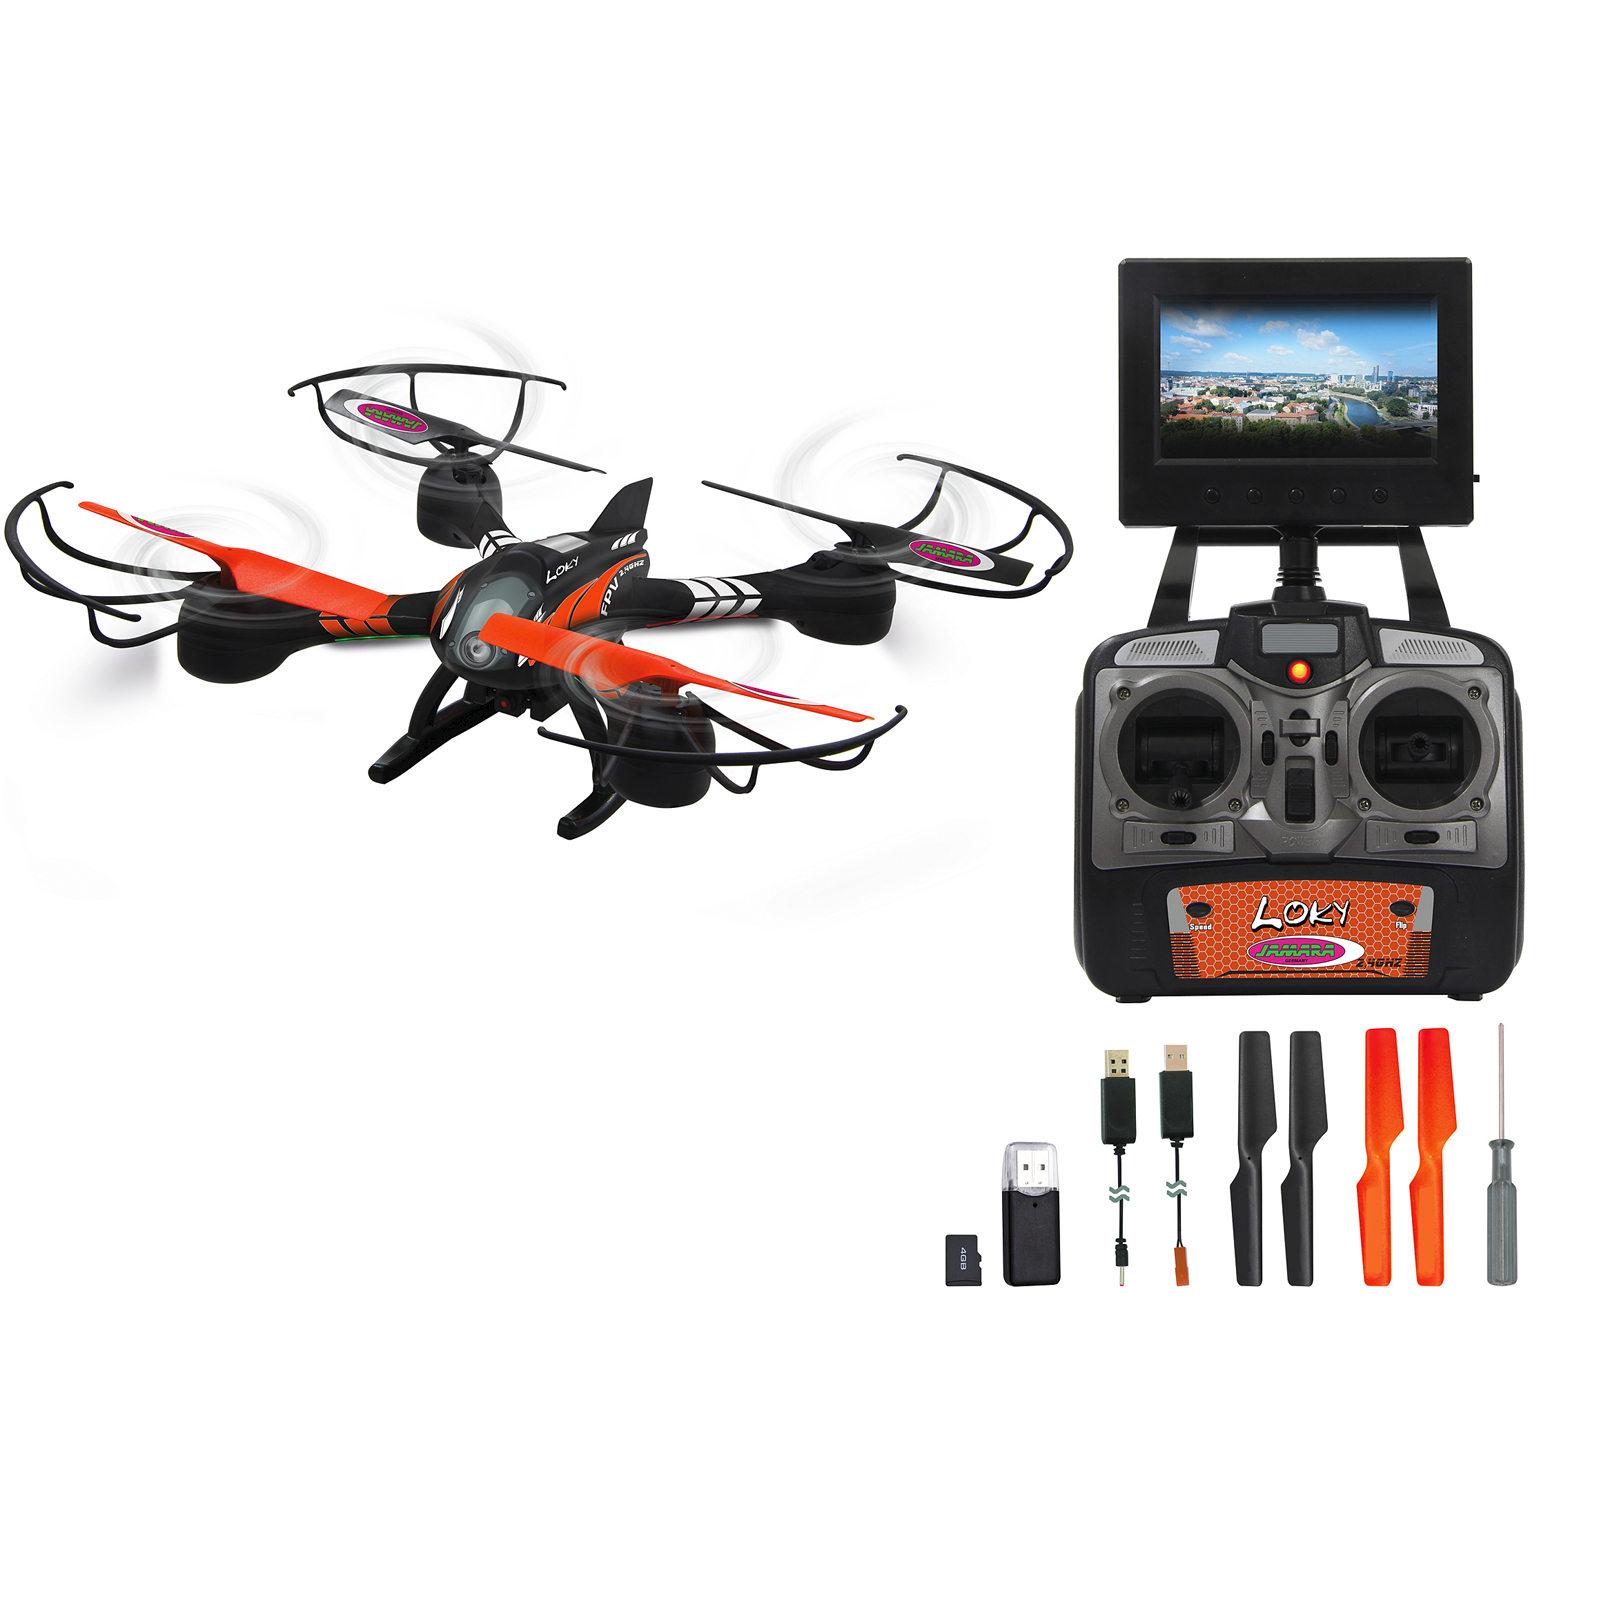 Jamara Loky FPV AHP + Quadrocopter 422001, with Camera 4042774416904 ...